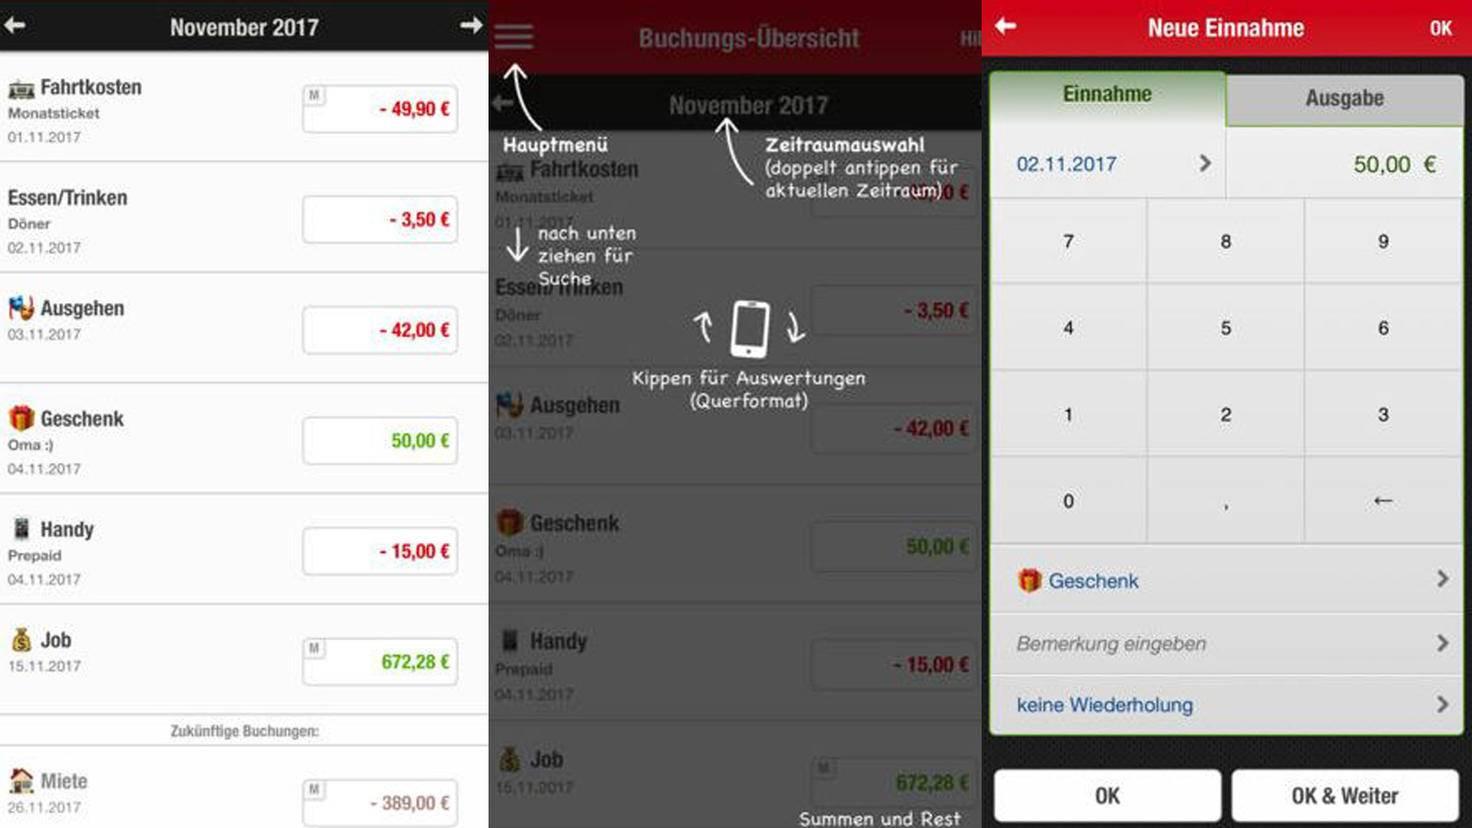 Haushaltsbuch-App Finanzchecker